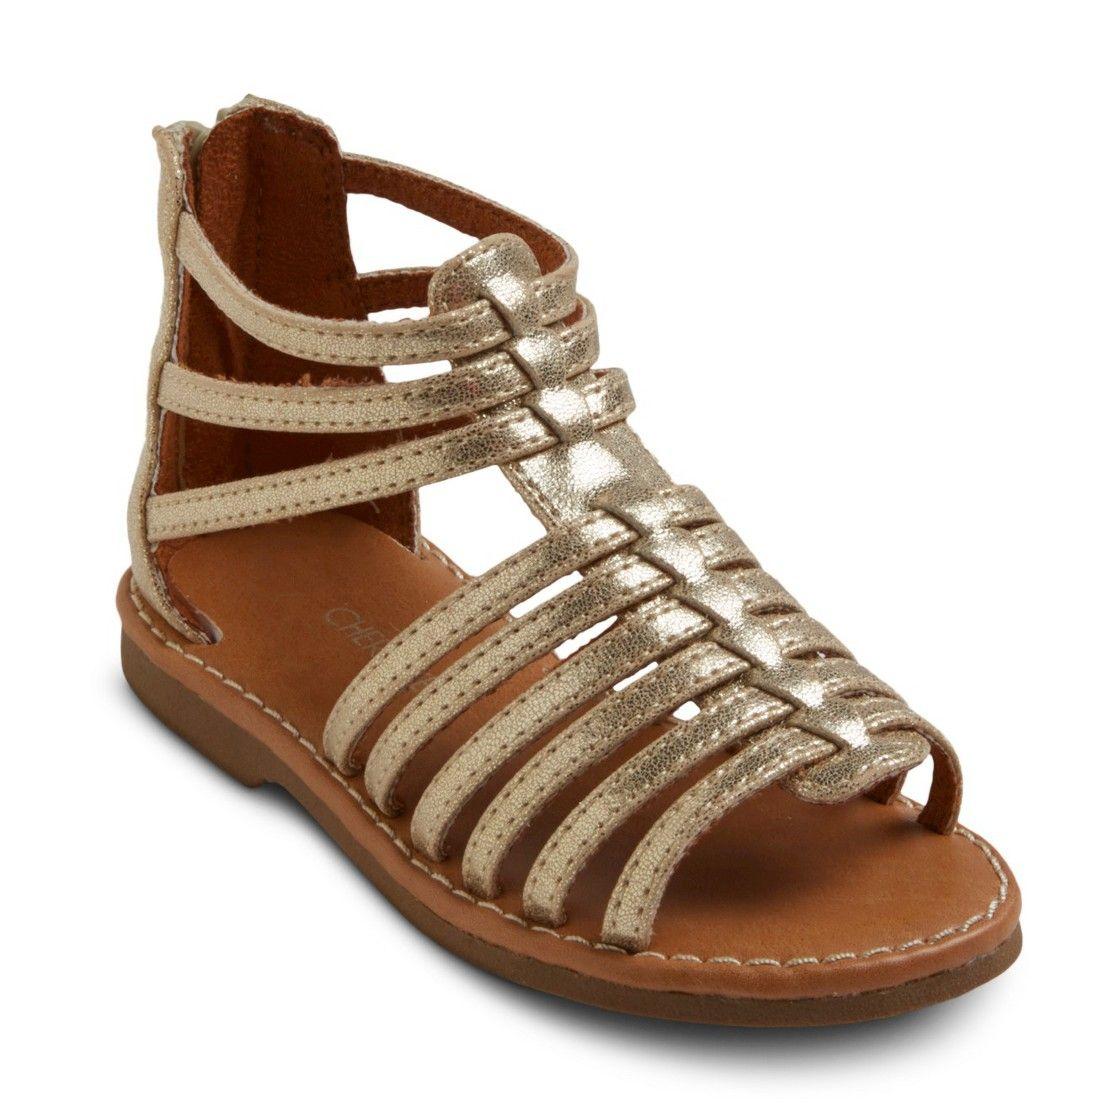 15984b2a7633 Toddler Girl s Cherokee  Jennifer Gladiator Sandals - Assorted Colors